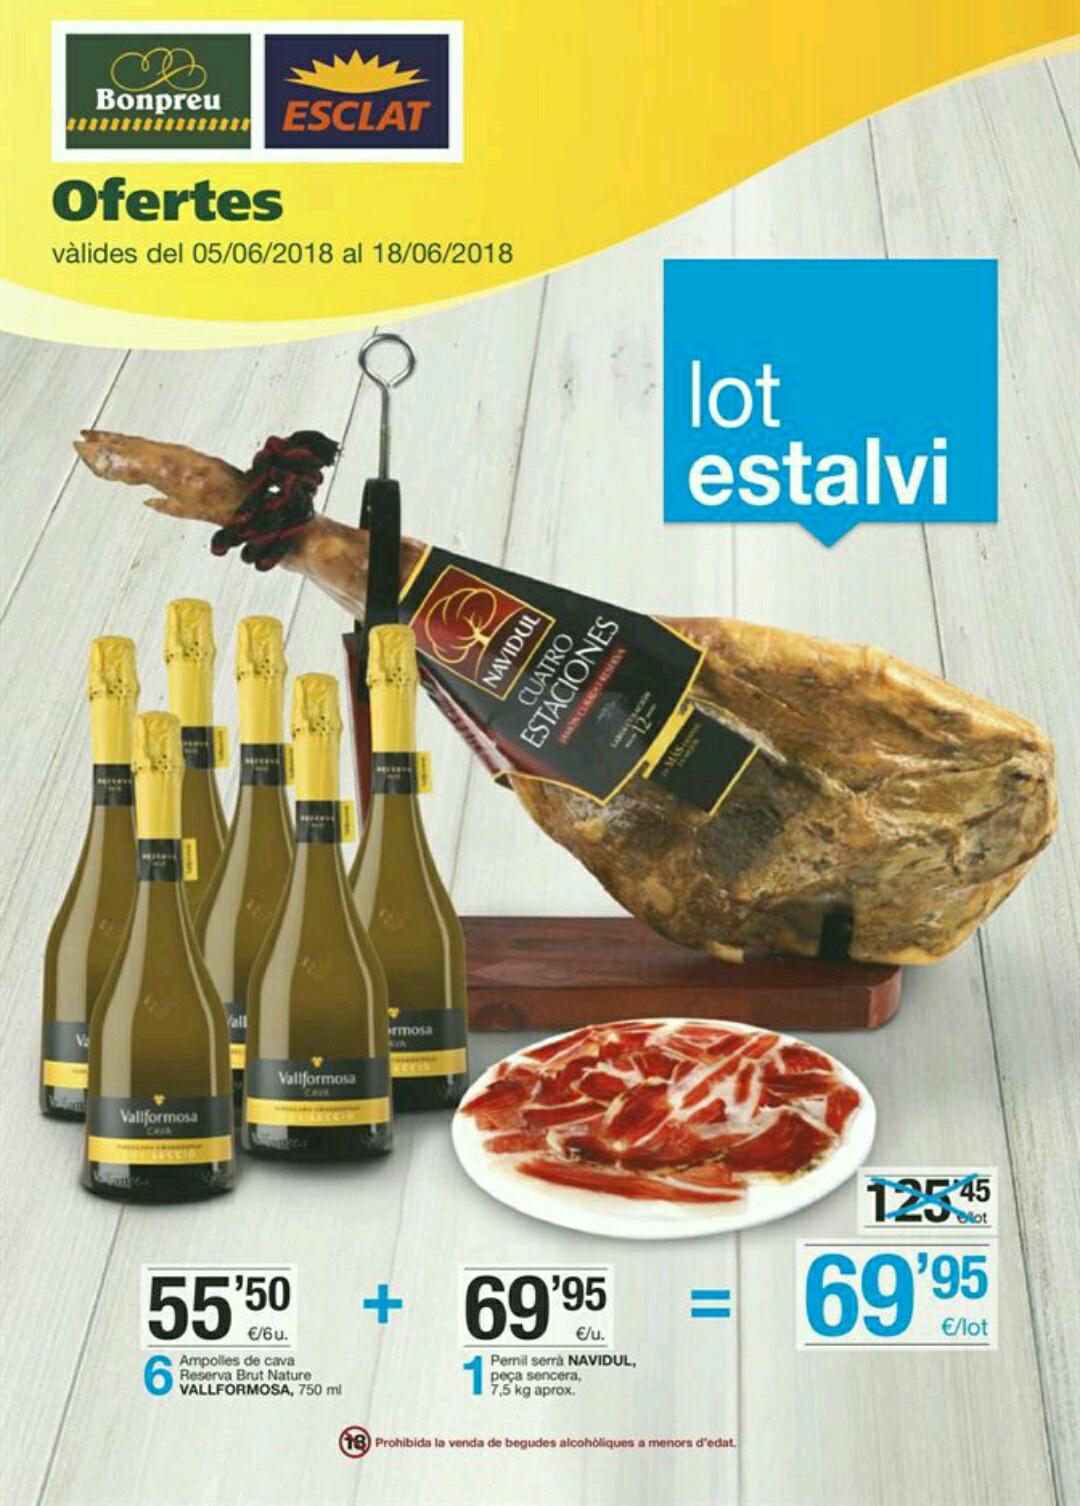 Lote ahorro Jamón Navidul + 6 botellas de Cava en Cataluña